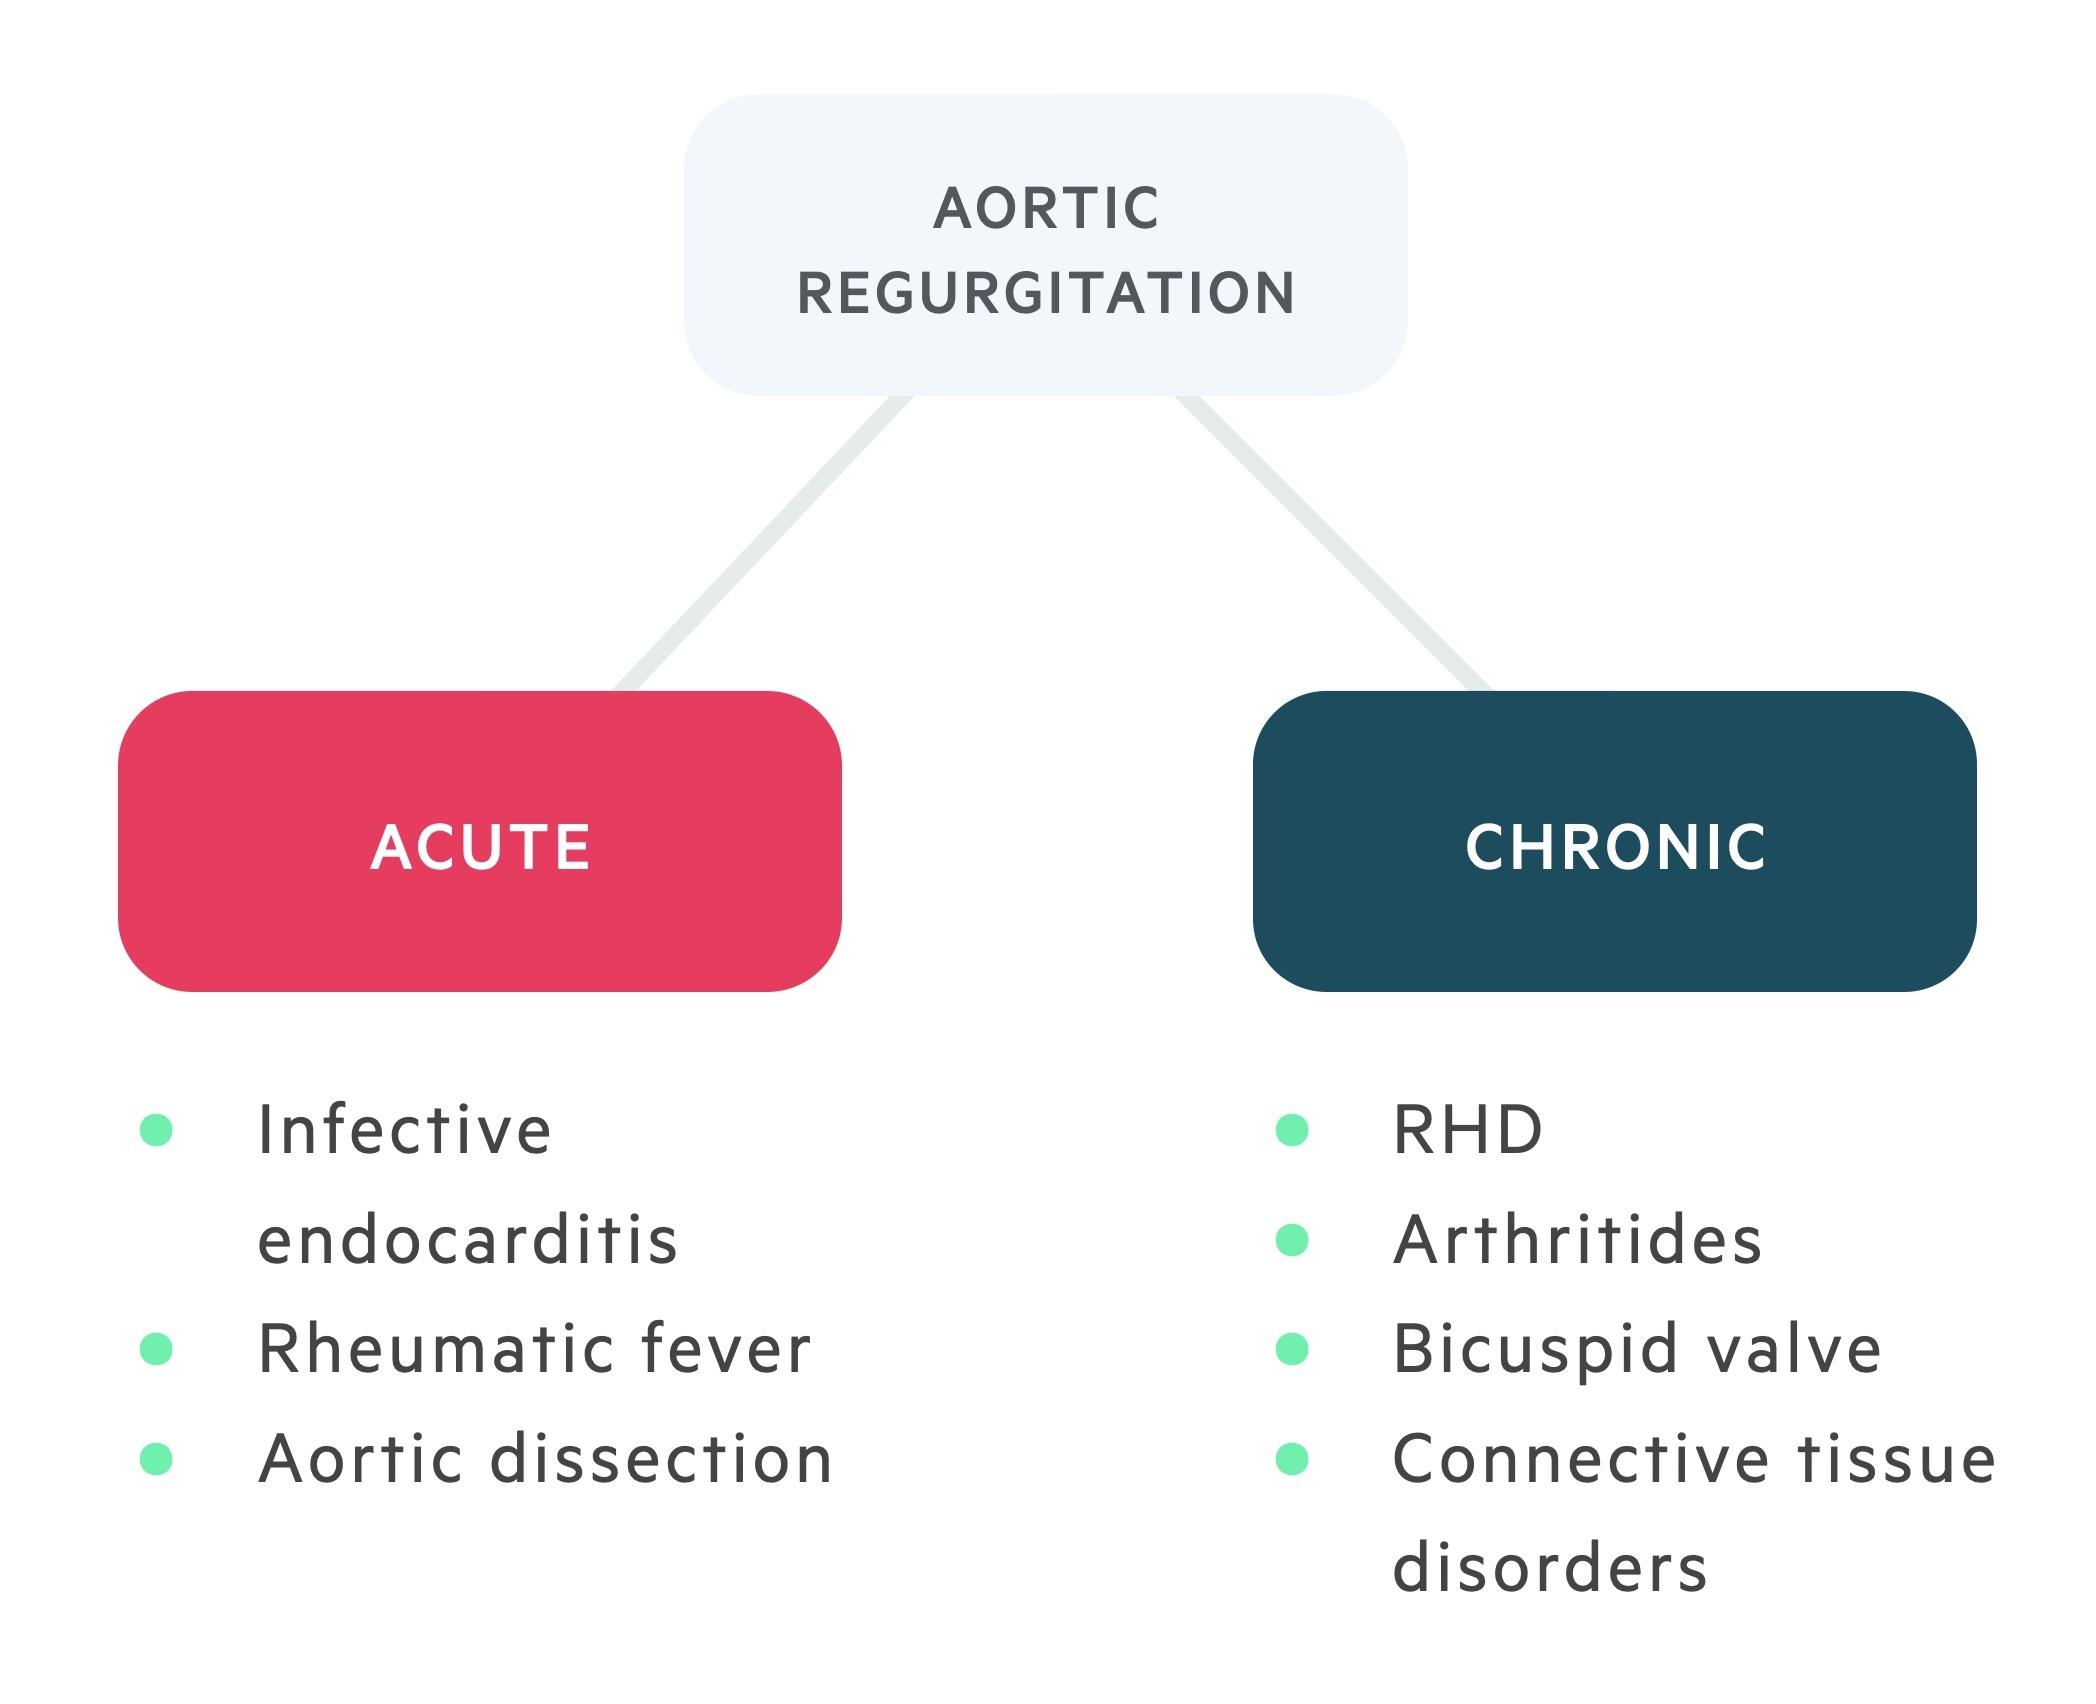 Acute & chronic aortic regurgitation (AR)